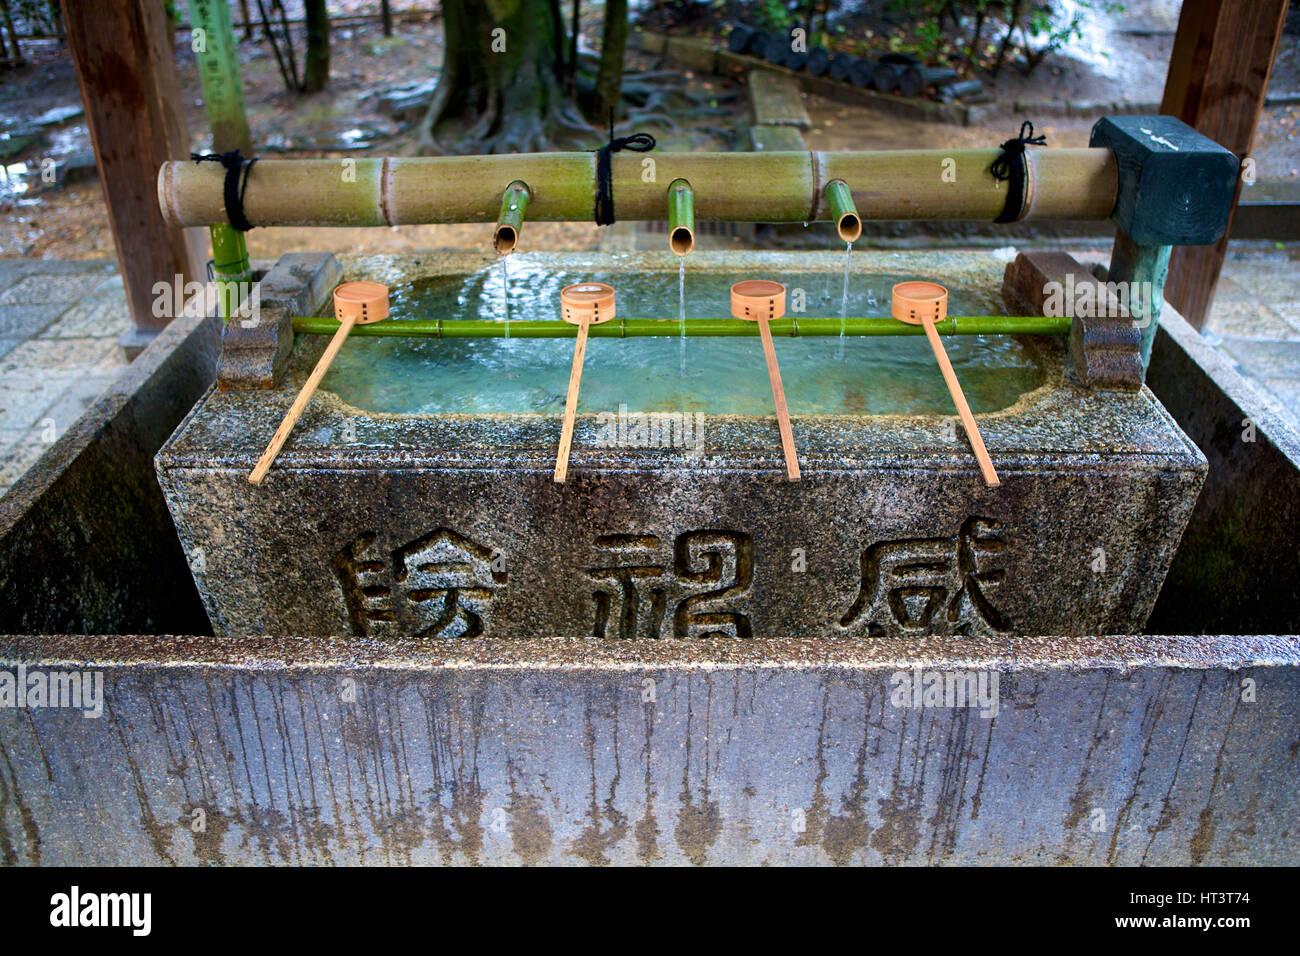 Purification fountain at Yasaka Shinto shrine in Kyoto Japan. - Stock Image